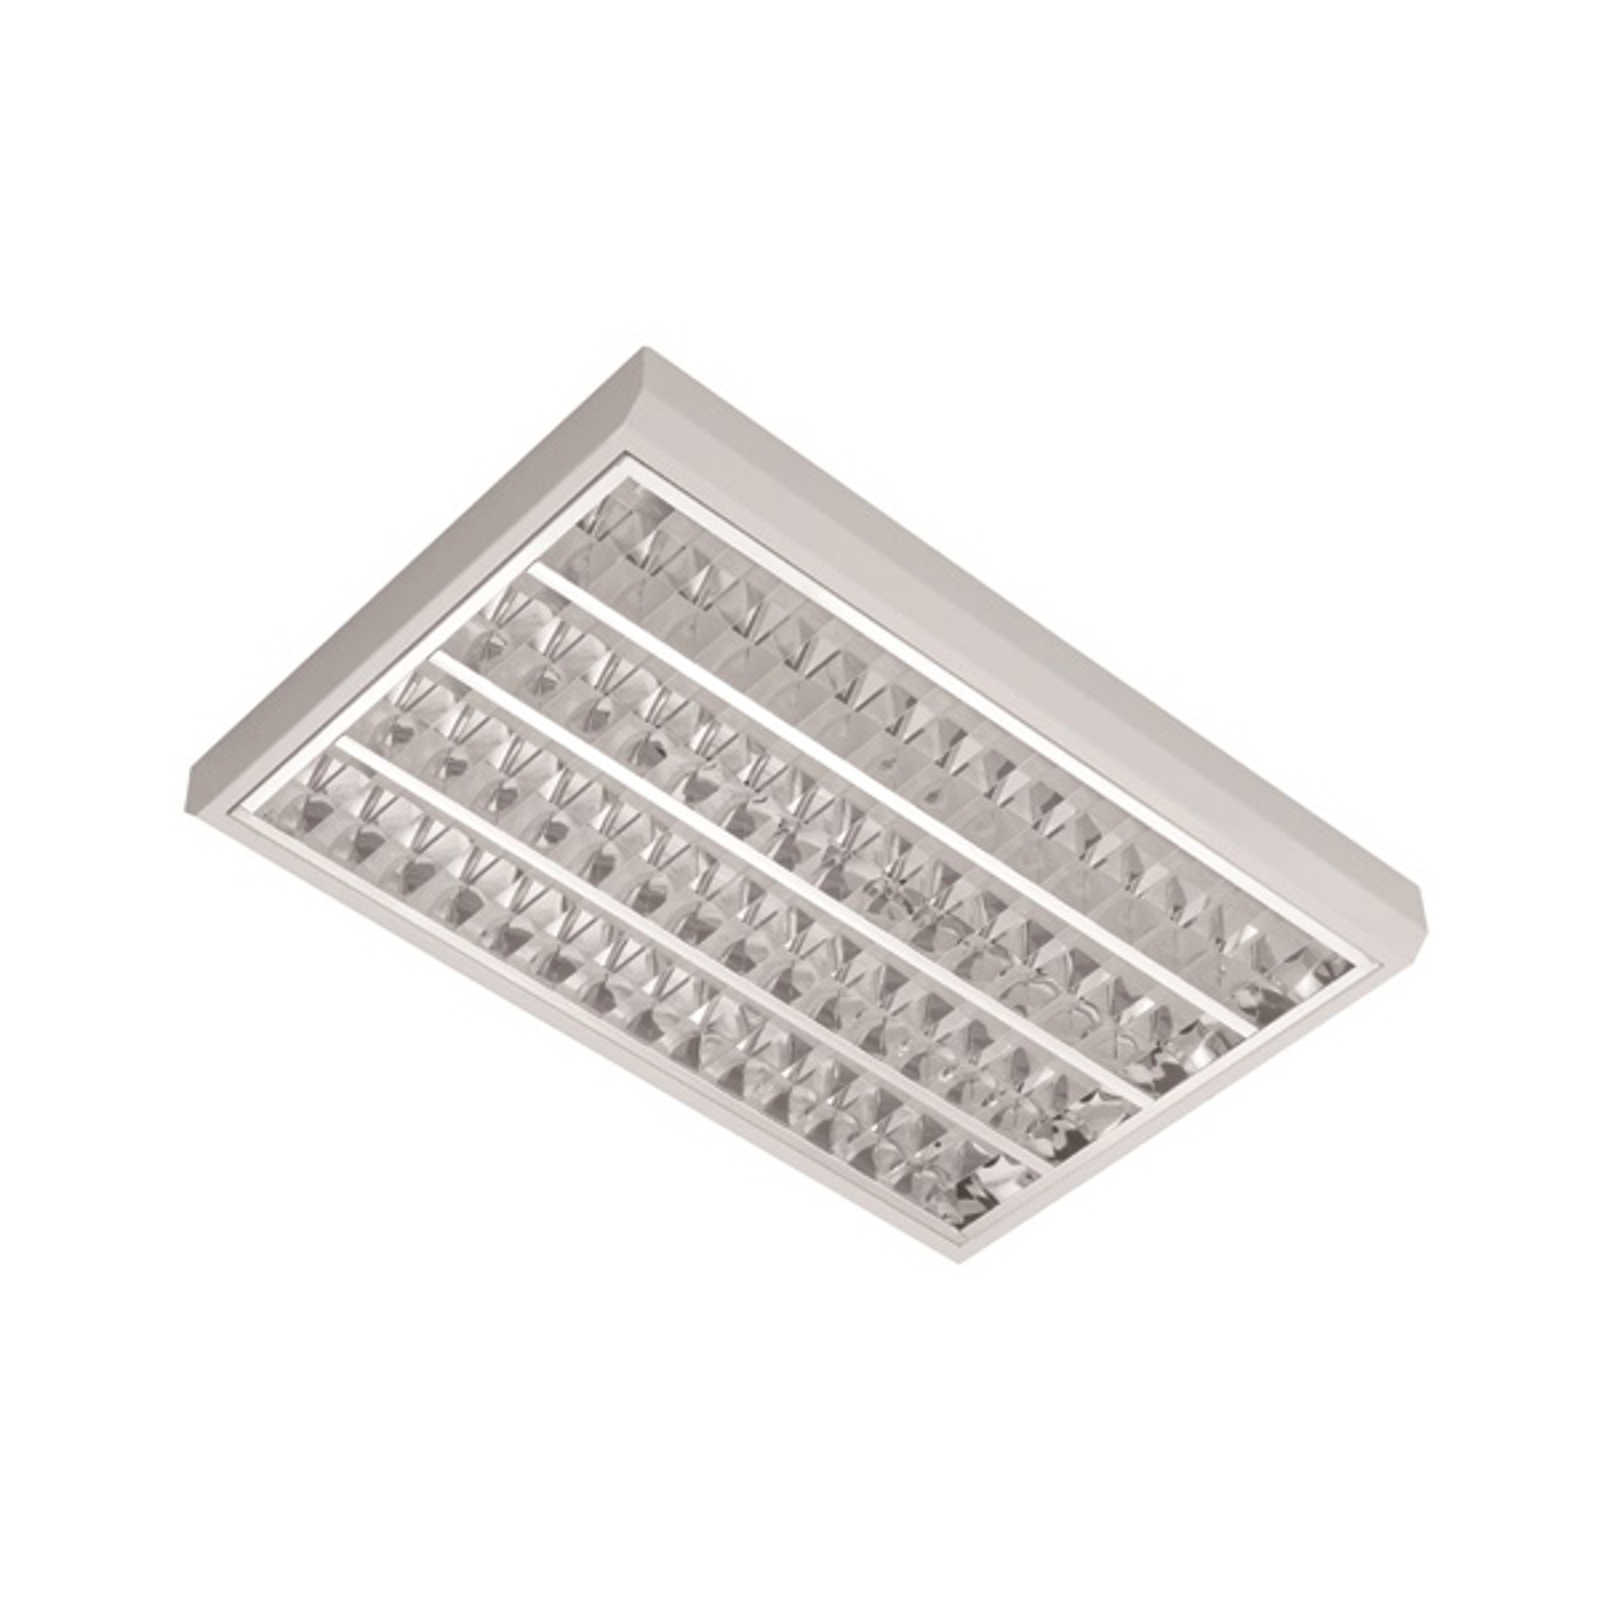 LED-Raster-Anbauleuchte UGR 39 W 4.000 K